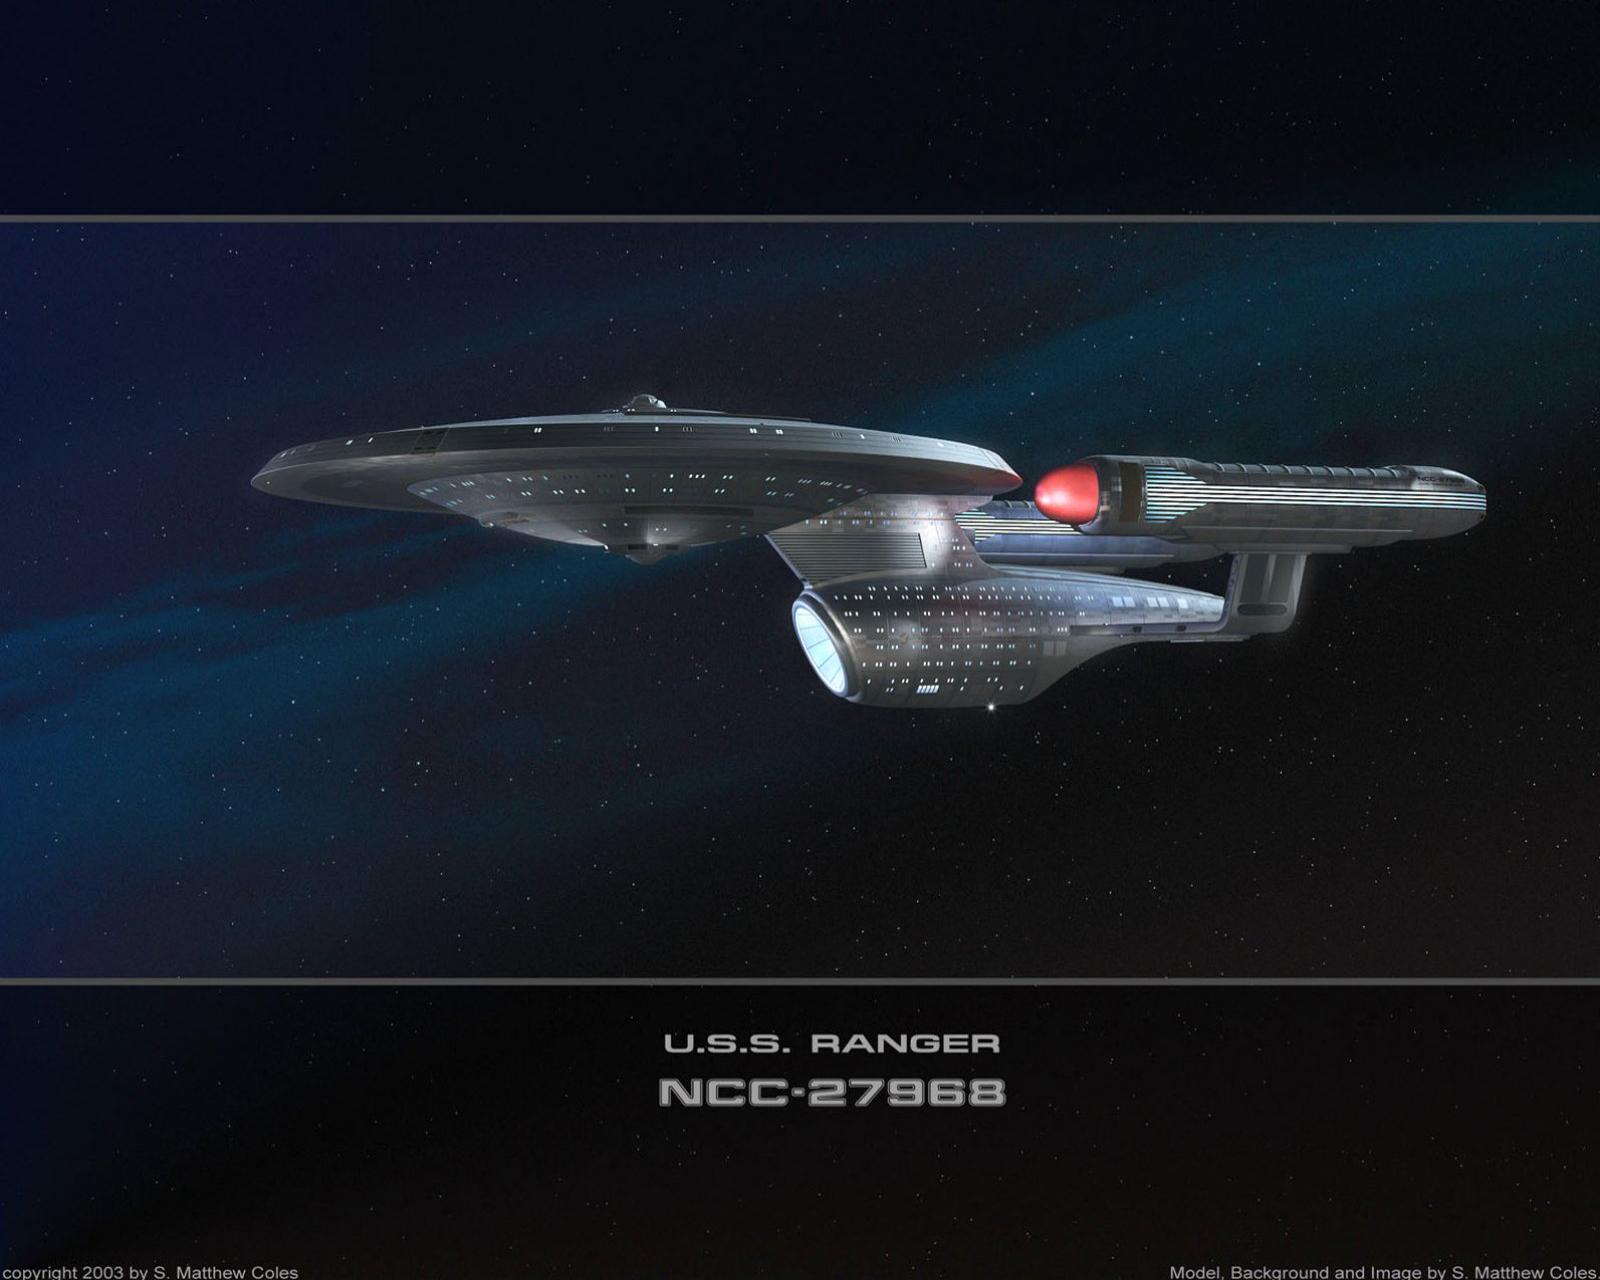 starship wallpaper Star Trek desktop wallpaper size 1600x1280 1600x1280